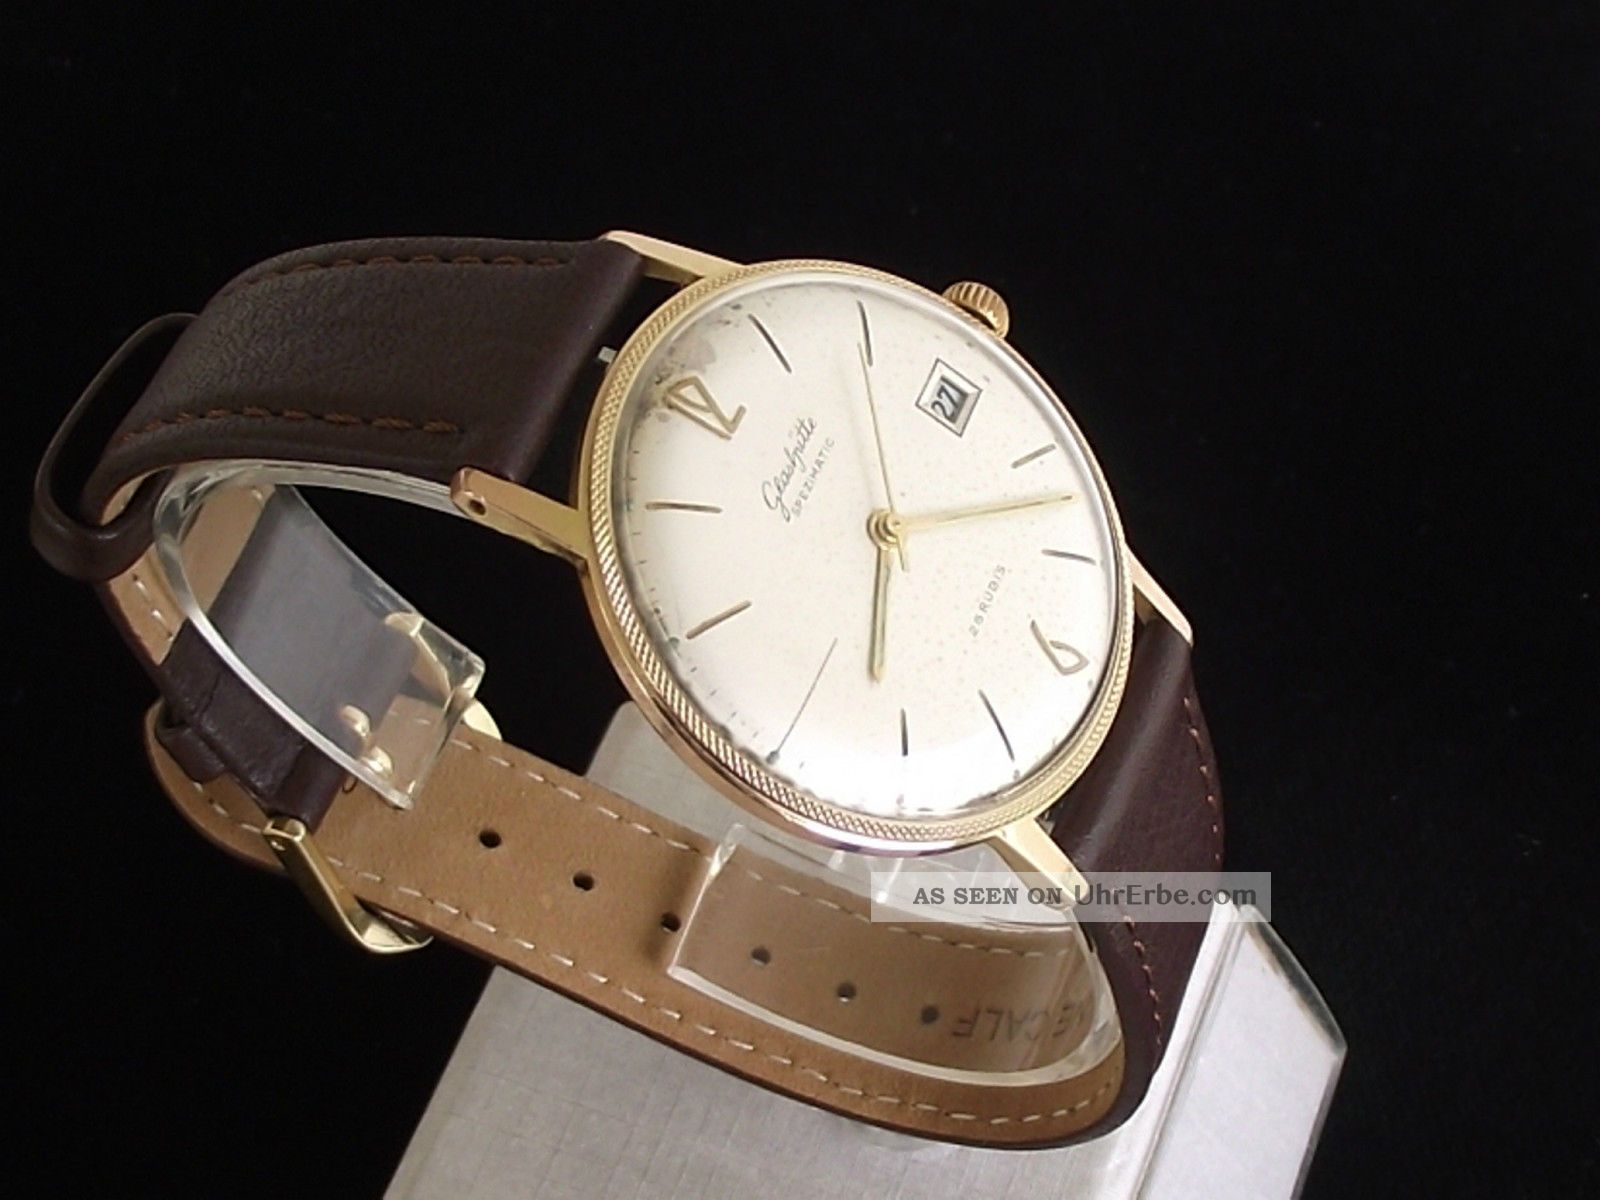 Große,  Tolle Gub GlashÜtte Spezimatic Herrenuhr Kal.  75 - Seltenes Gehäuse Armbanduhren Bild